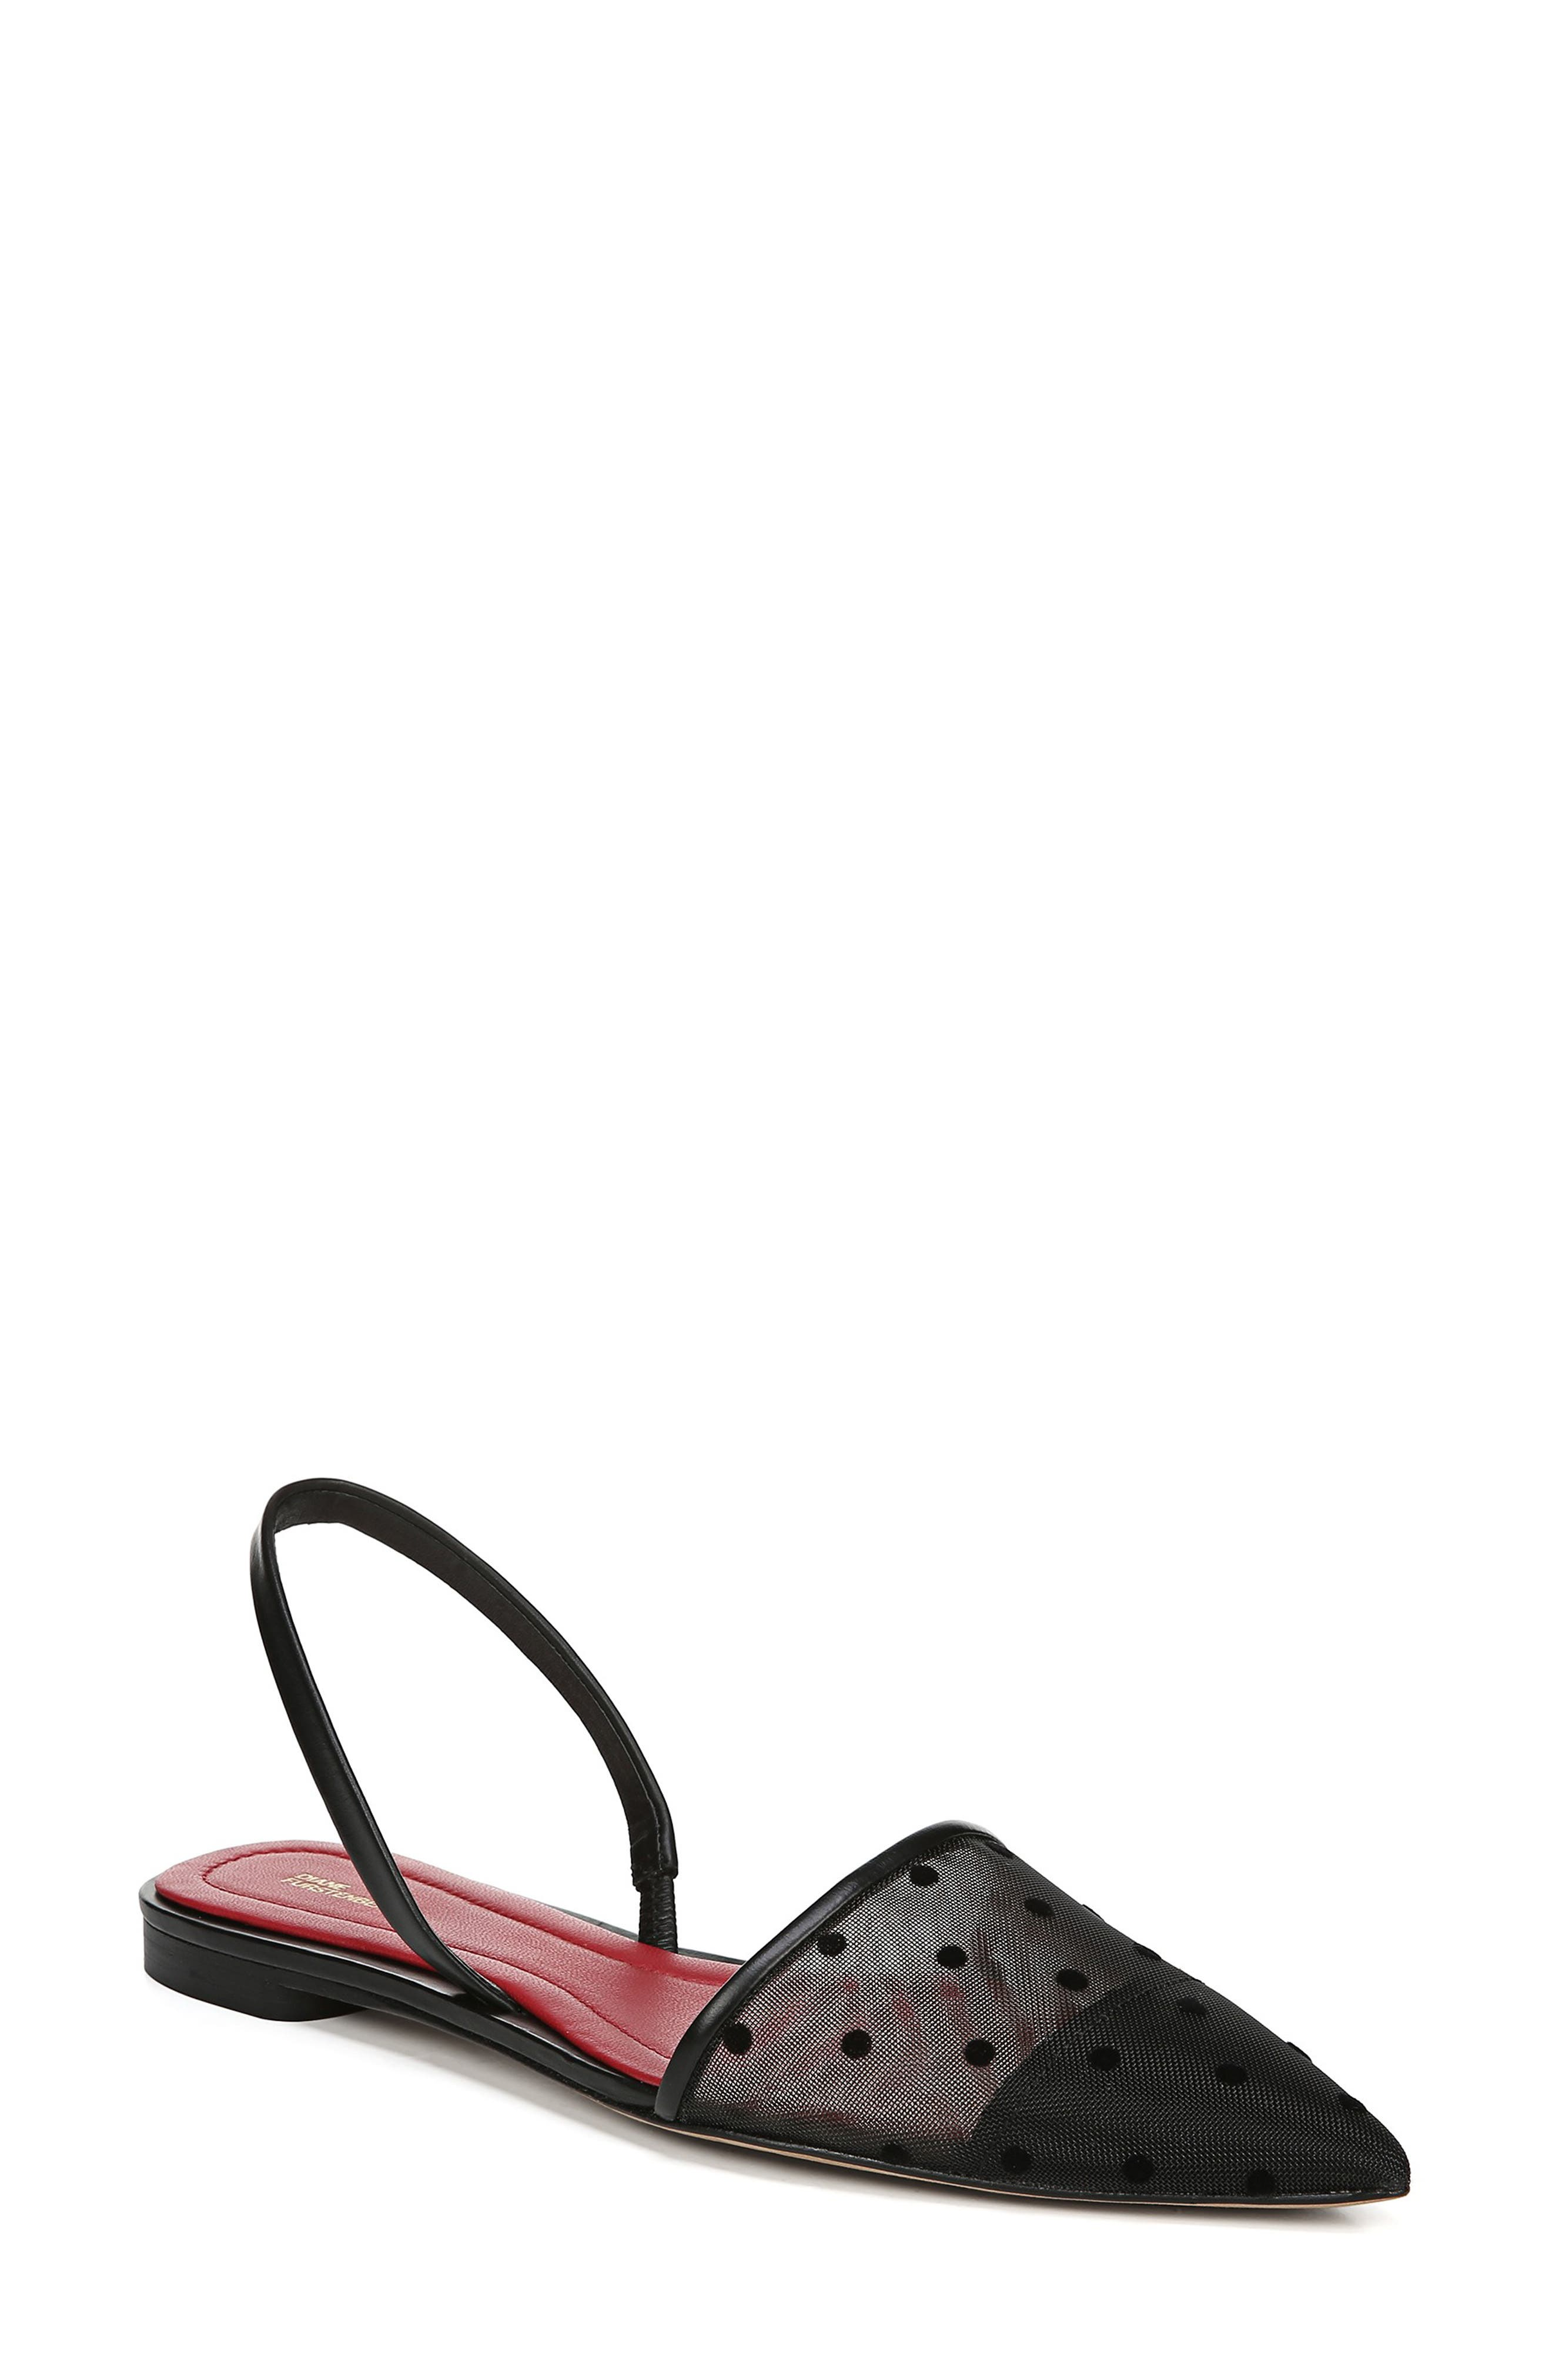 Diane Von Furstenberg Koko Slingback Flat- Black